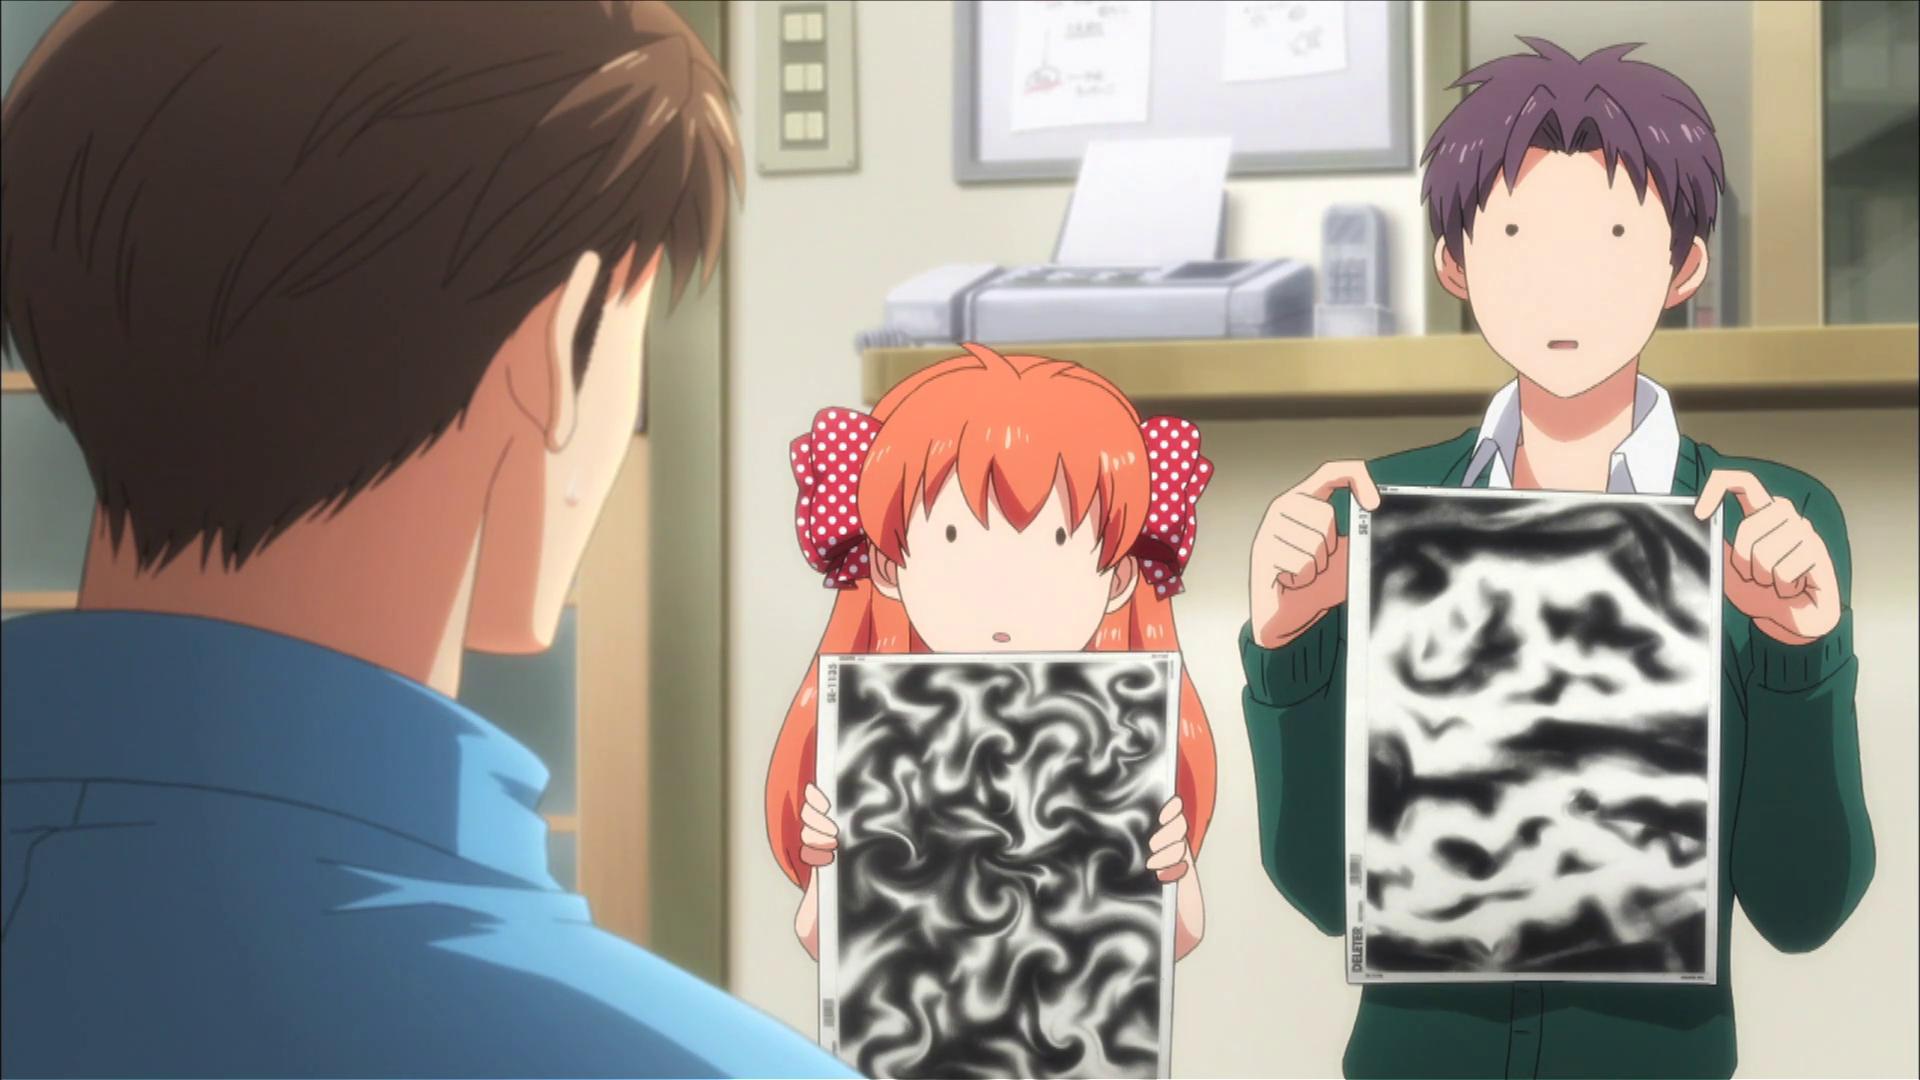 Monthly Girls' Nozaki-kun Episodes 5-7 Review